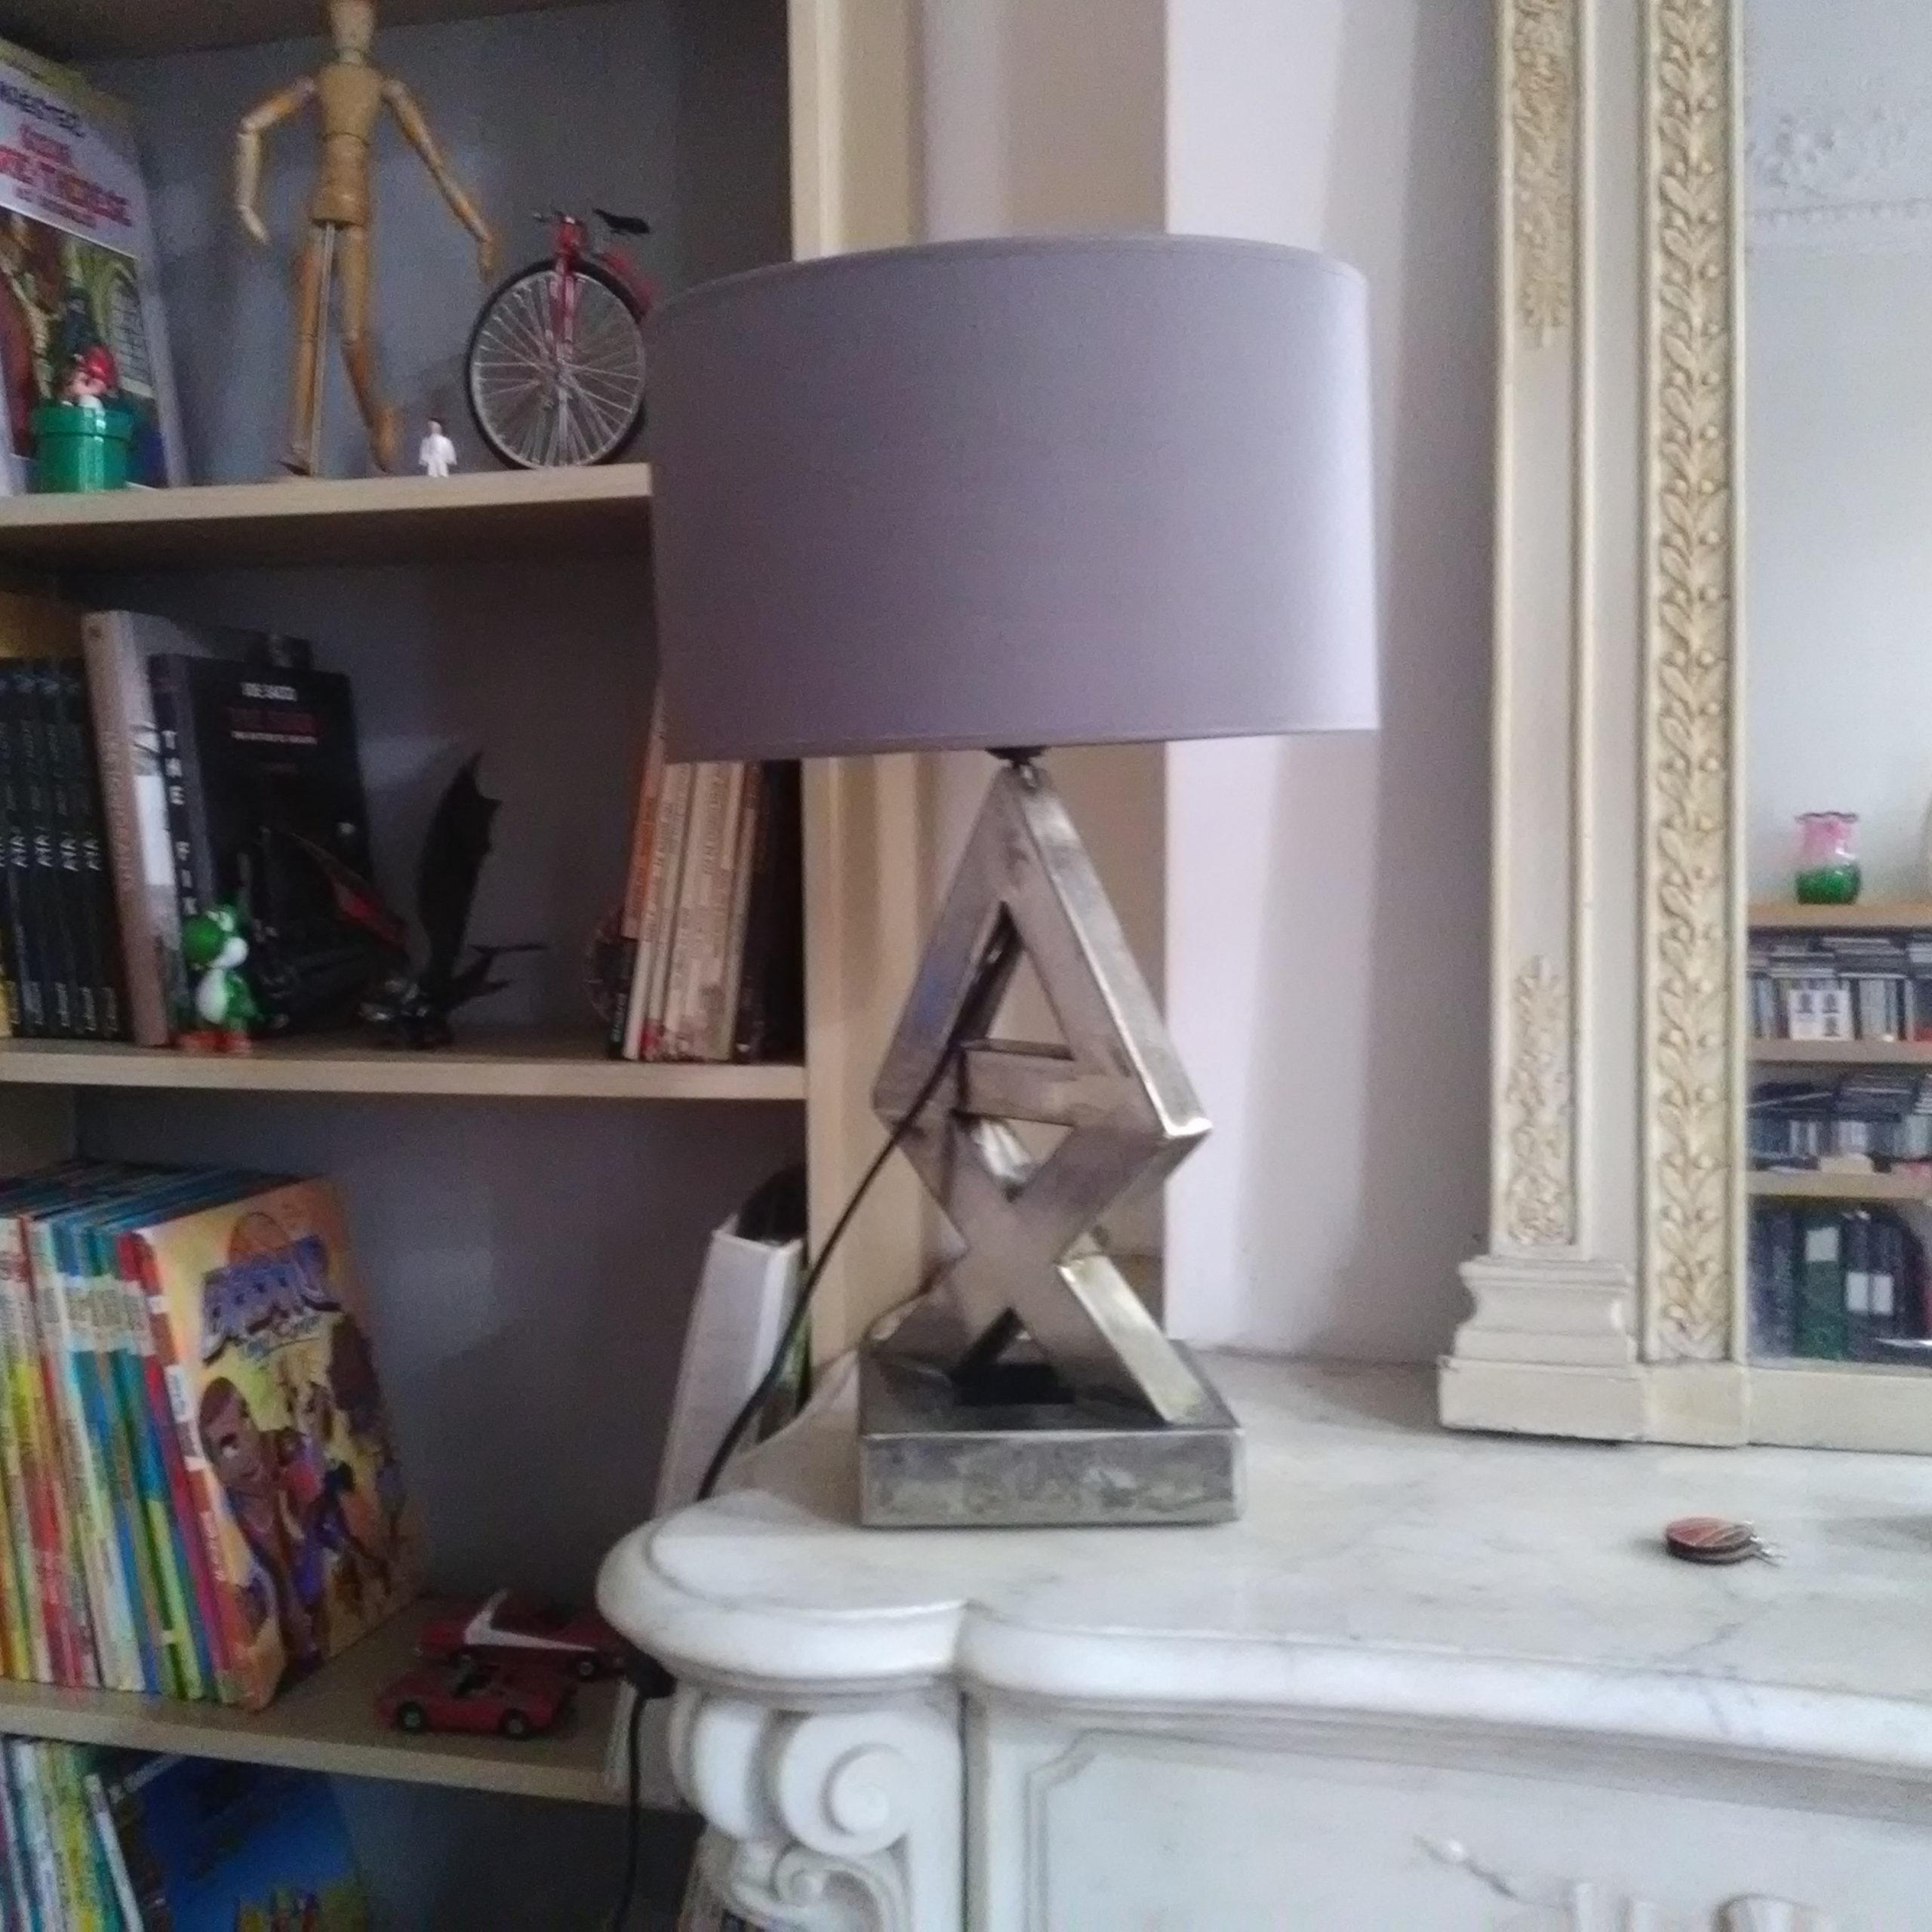 Lampe PS 3240×3240